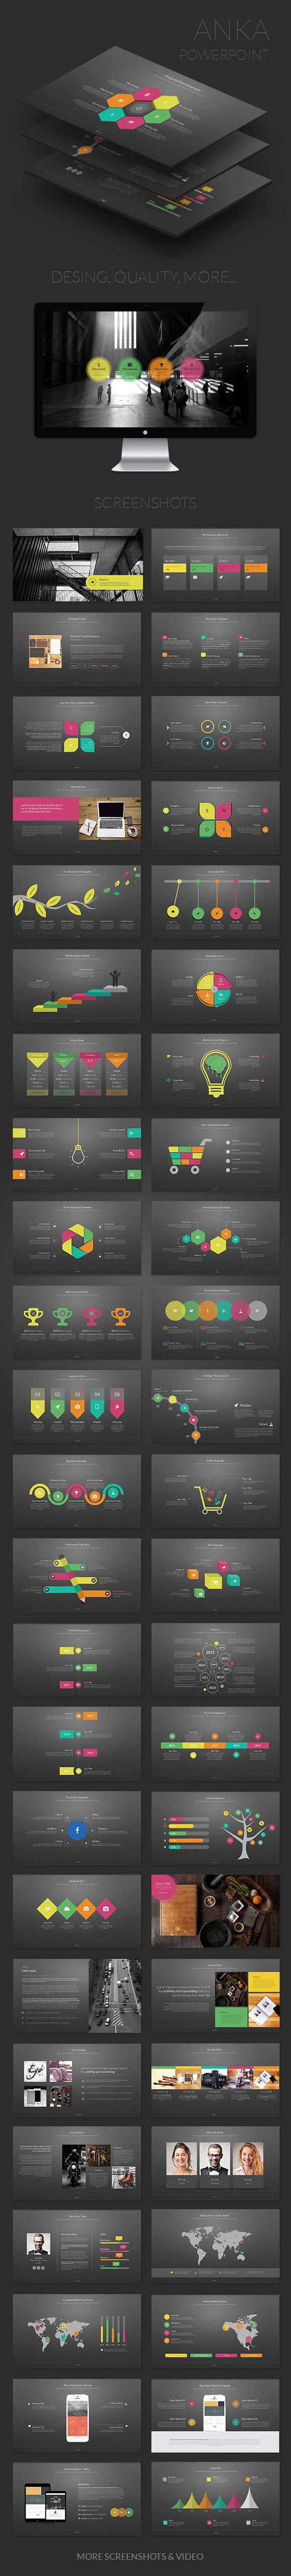 Anka Professional Powerpoint Template Download: http://graphicriver.net/item/anka-professional-powerpoint-template/10987089?ref=ksioks